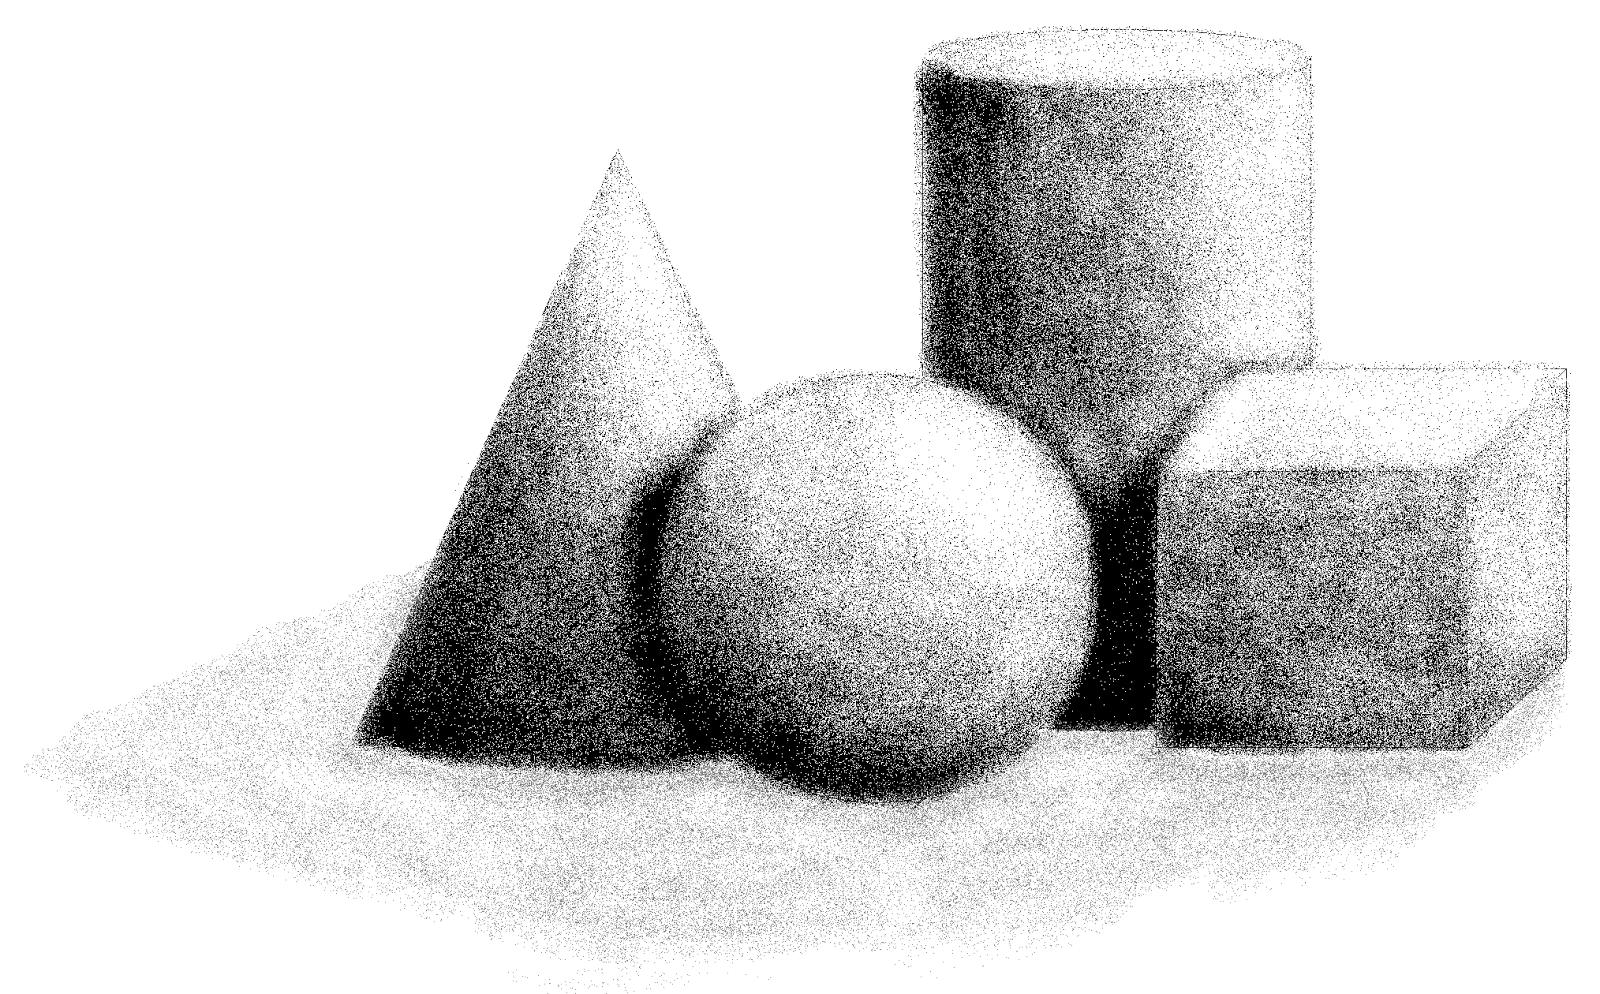 Figuras De Diseo Foto De Archivo Las Figuras Geomtricas